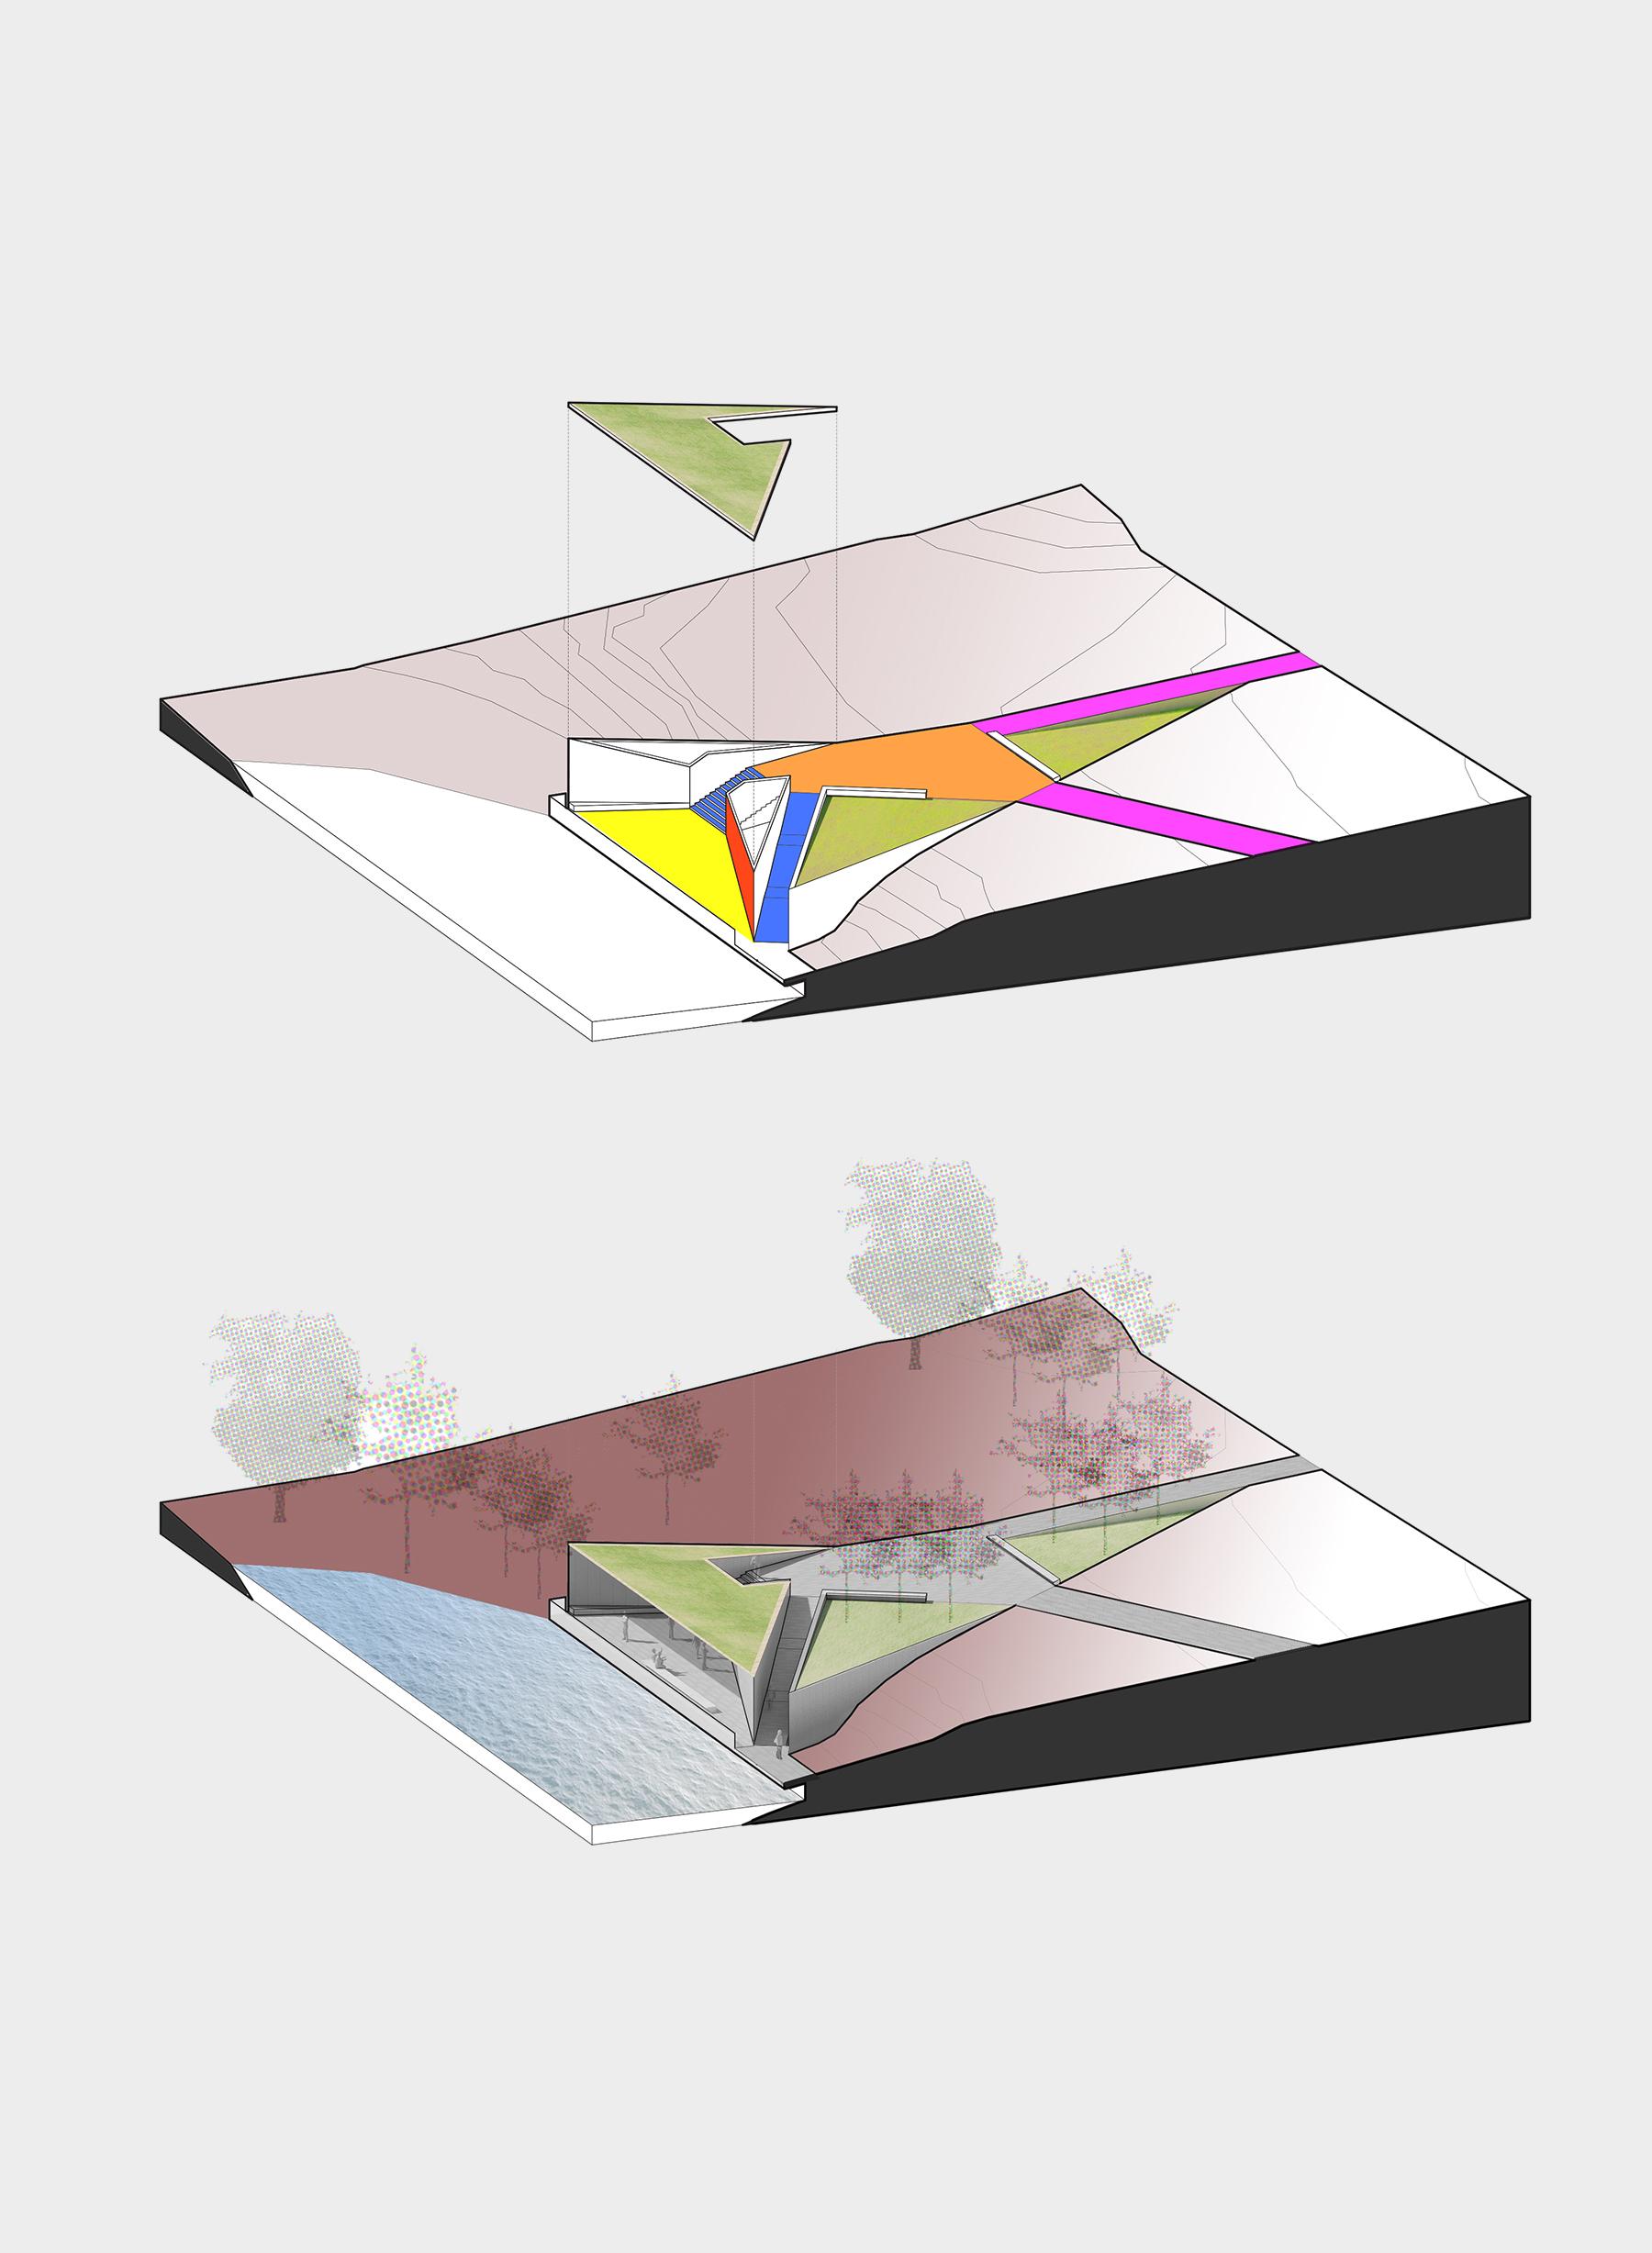 axon diagram copy.jpg